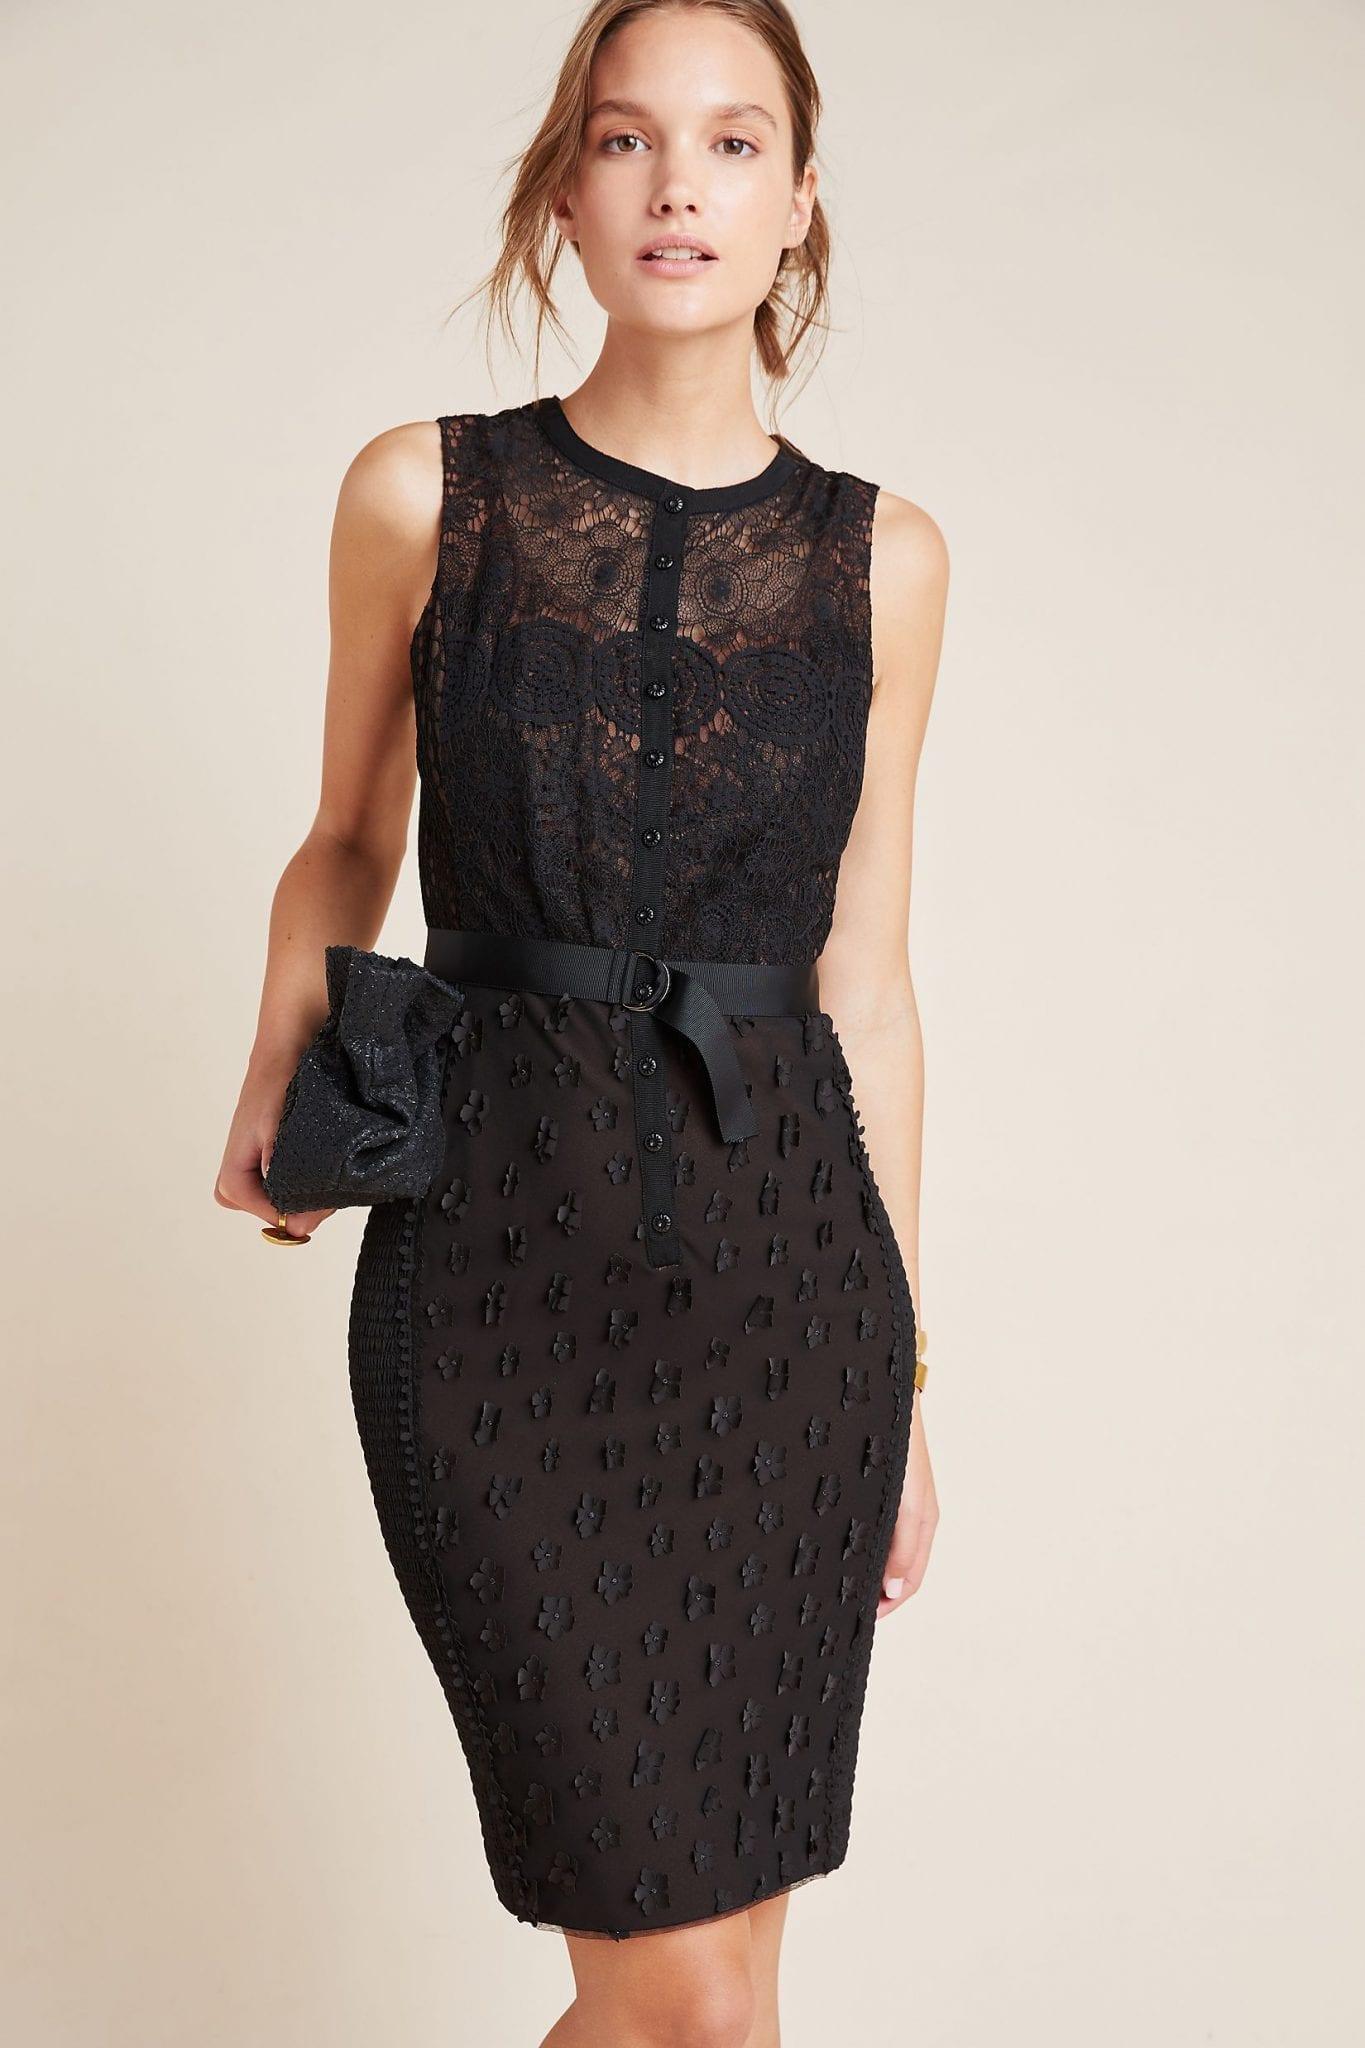 BYRON LARS Gisella Black Lace Sheath Dress